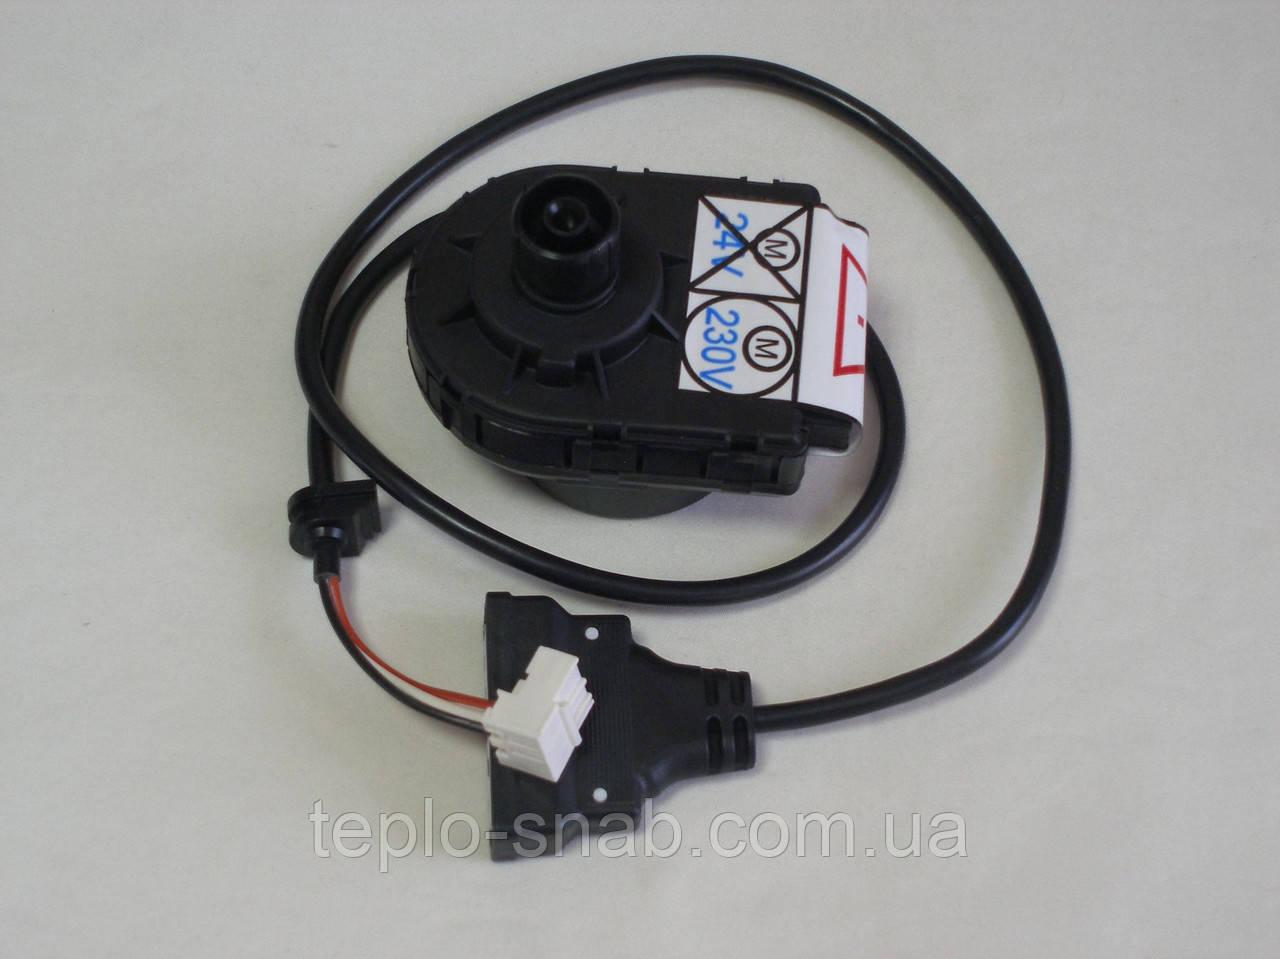 Электропривод (сервомотор) 3-х ходового клапана Junkers / Bocsh. 8707406098